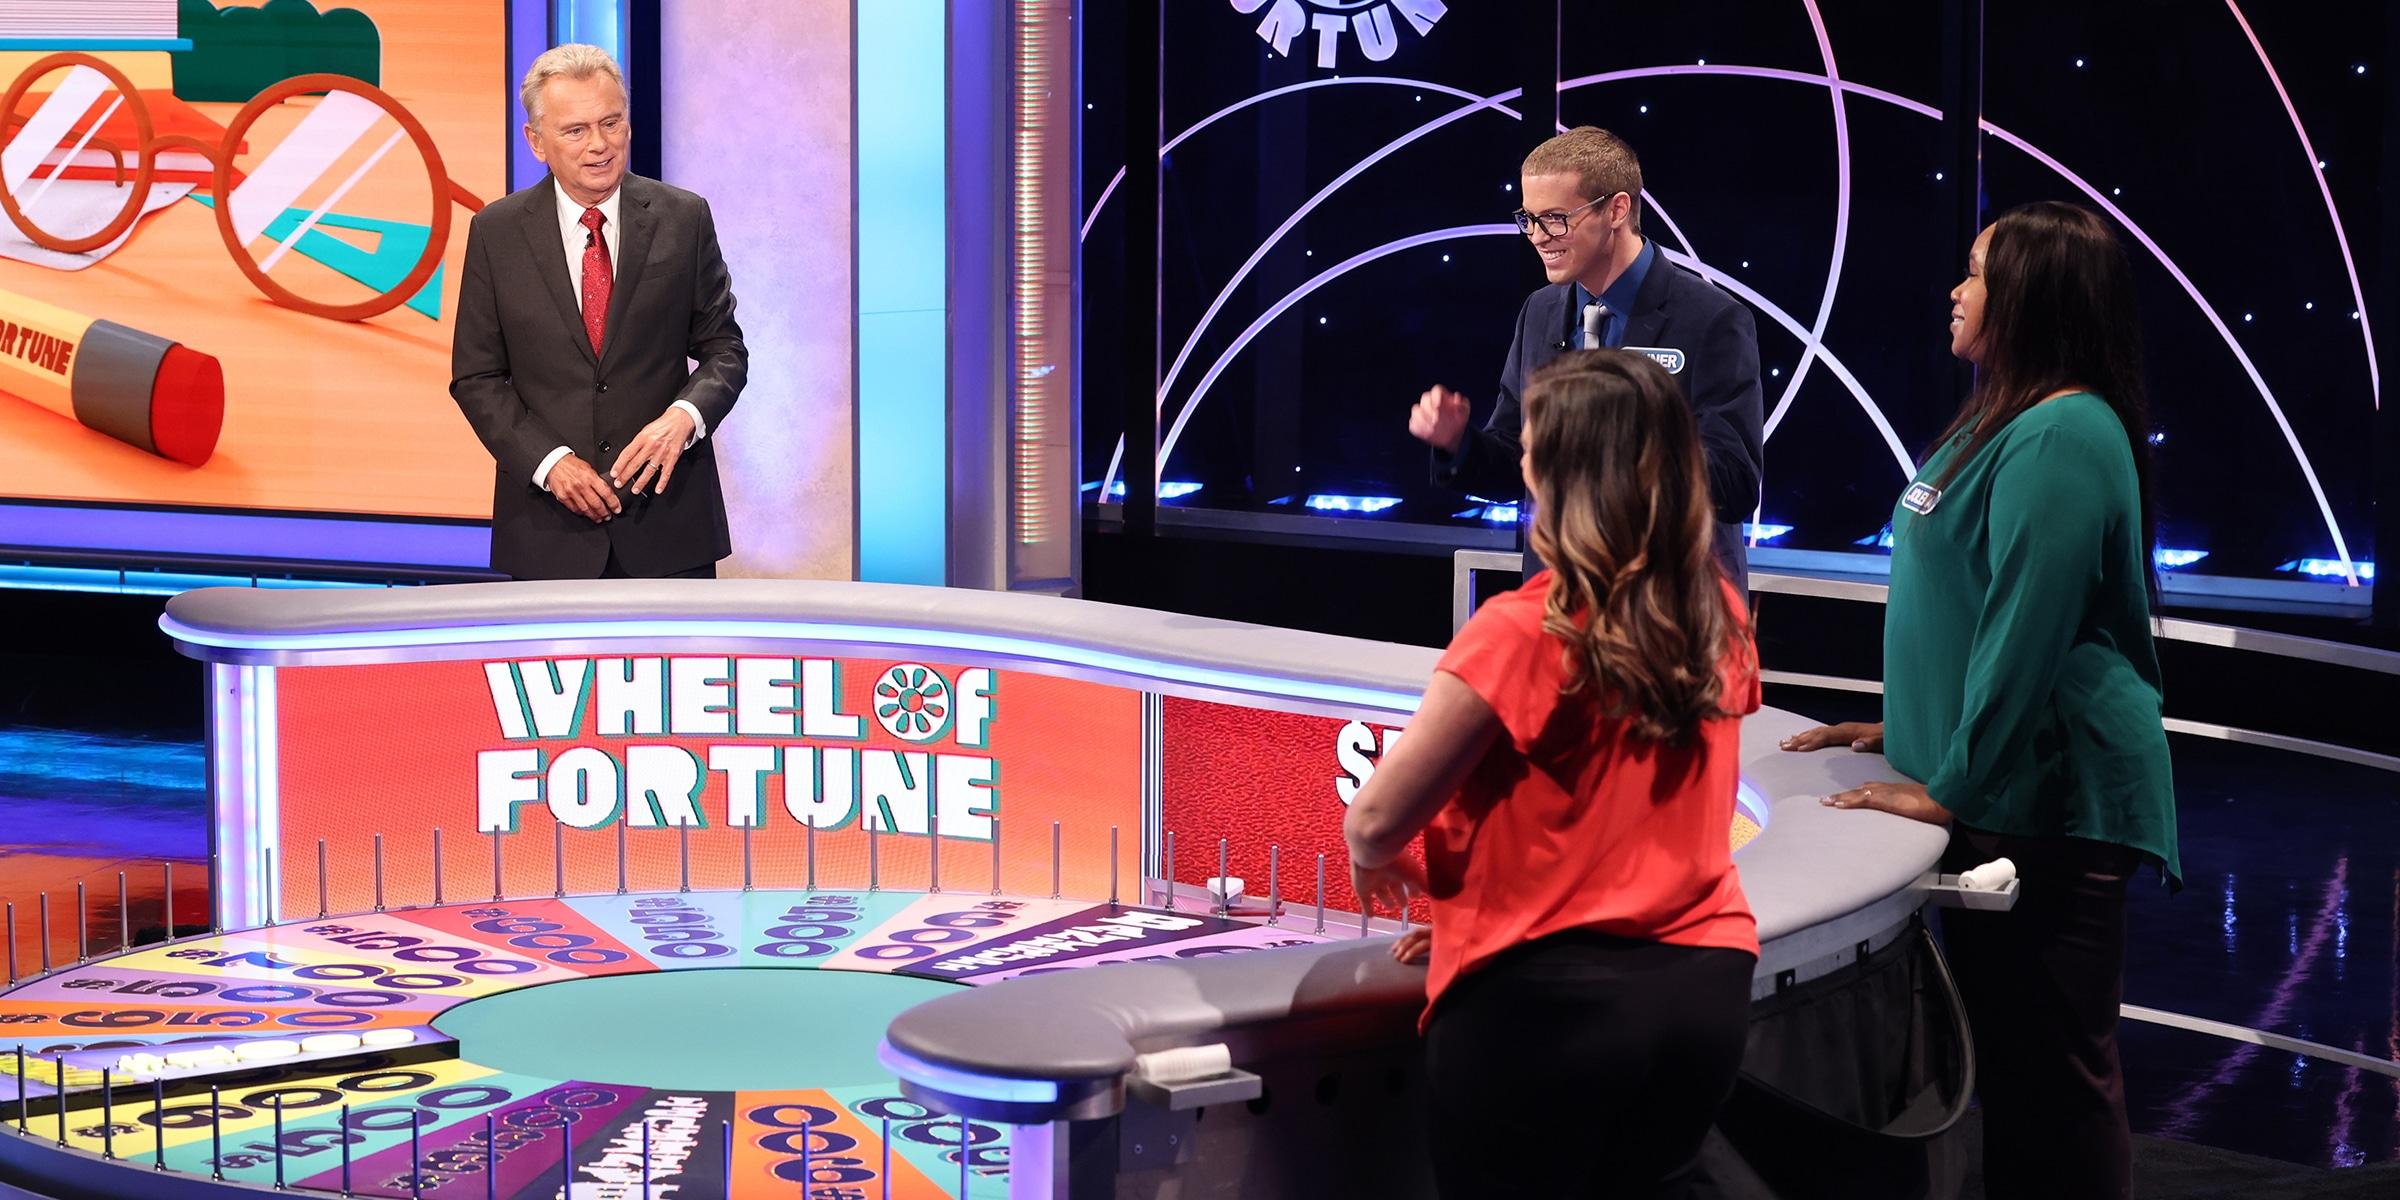 'Wheel of Fortune' contestants